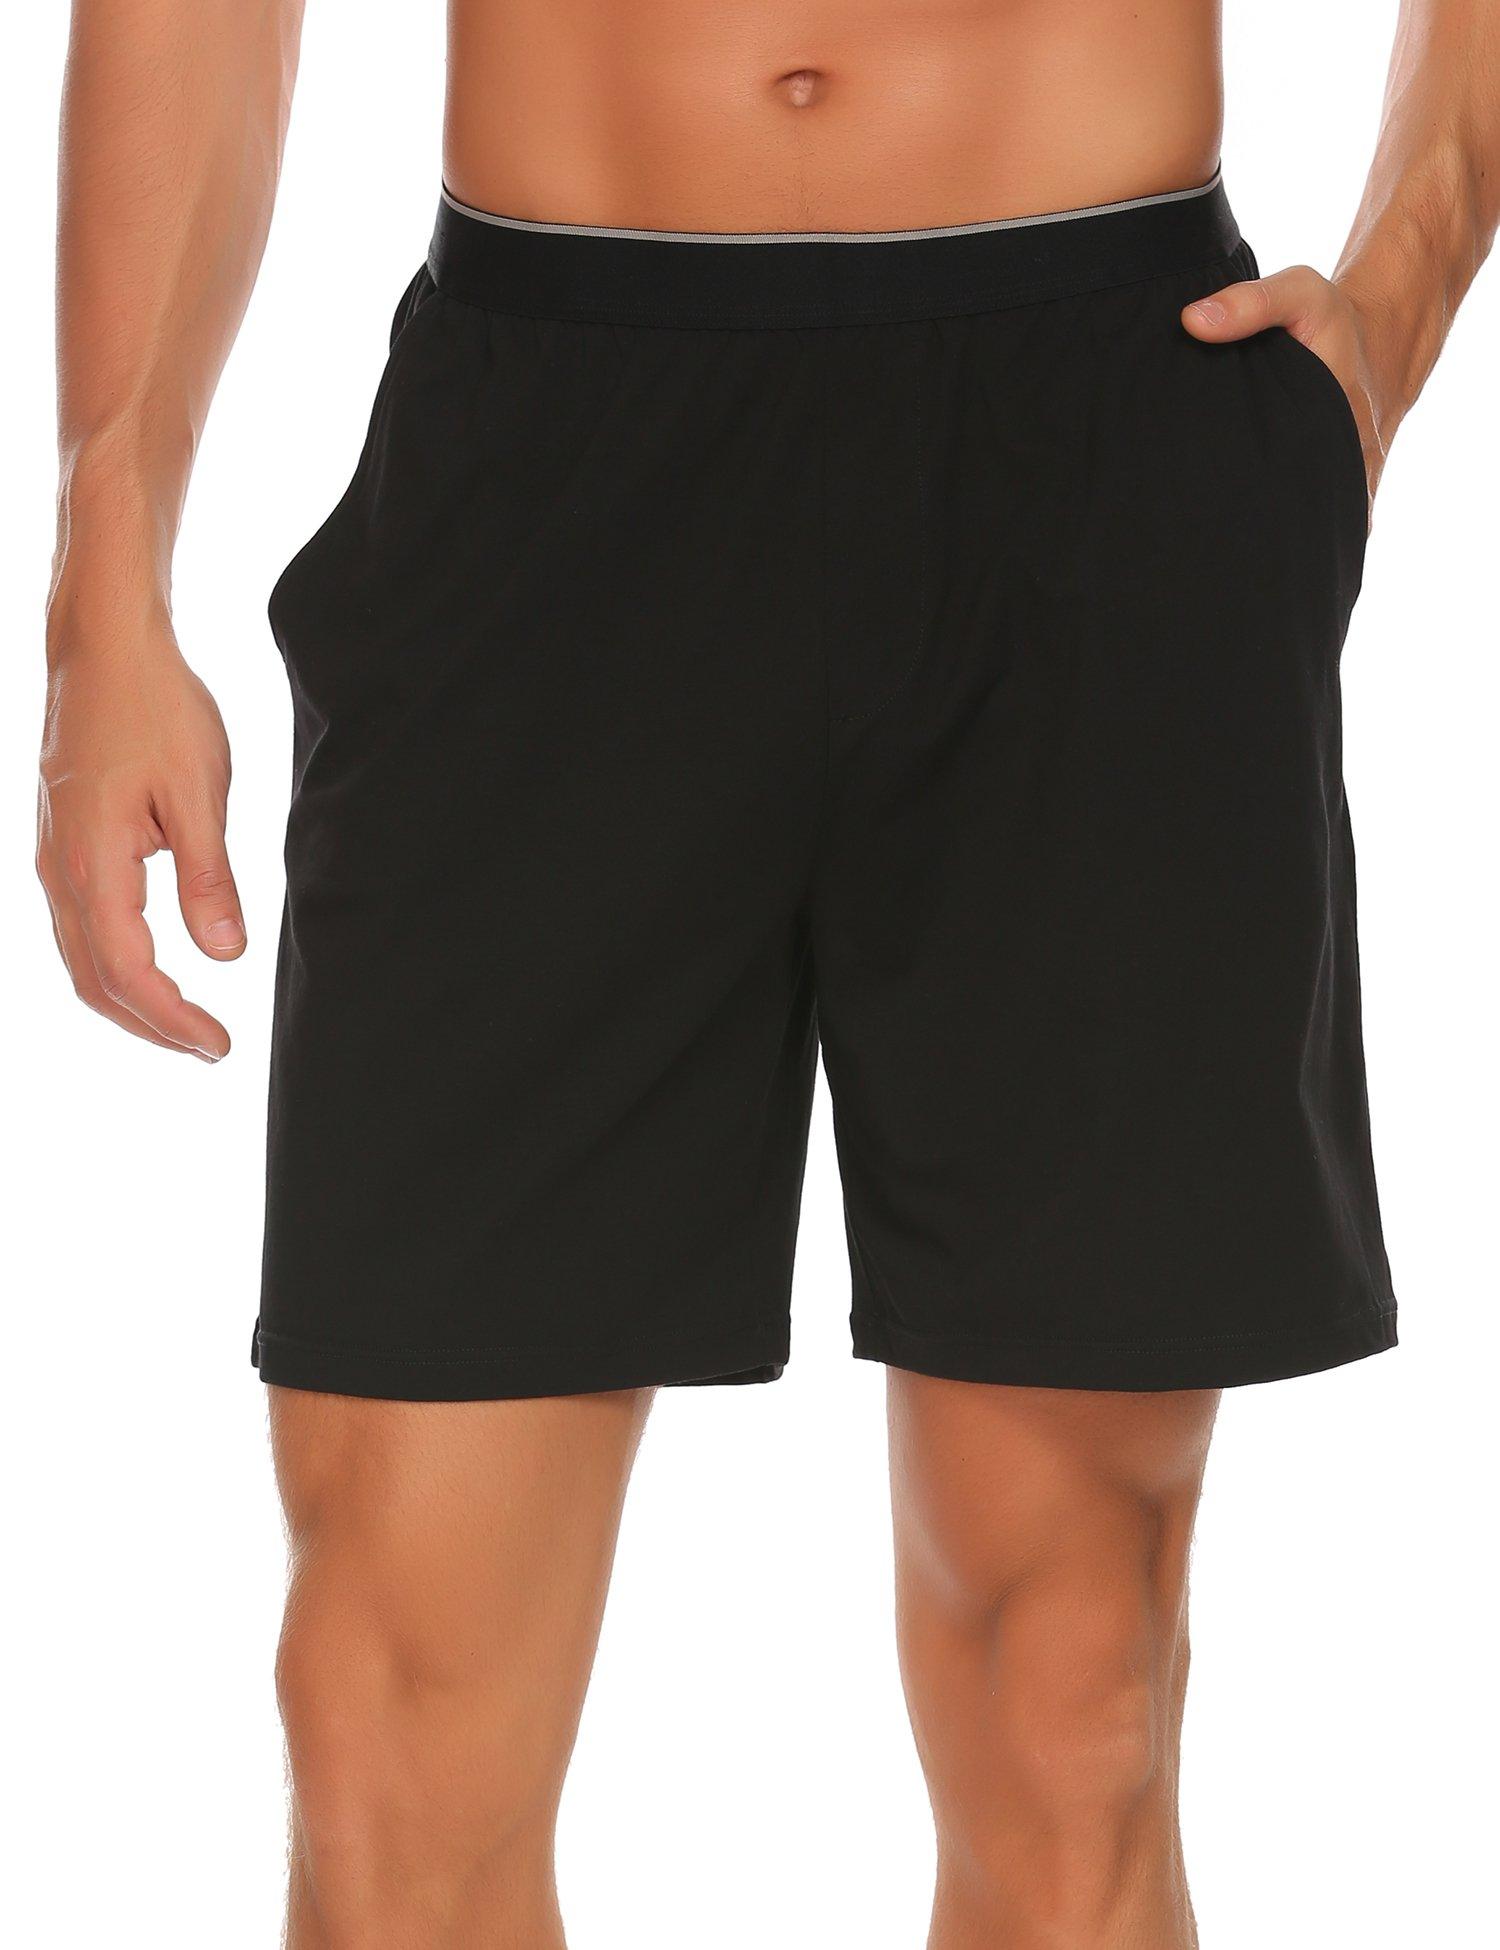 Goldenfox Men's Casual Classic Fit Gym Short Cotton Knit Pajama Lounge Sleep Pants (Black, Small)